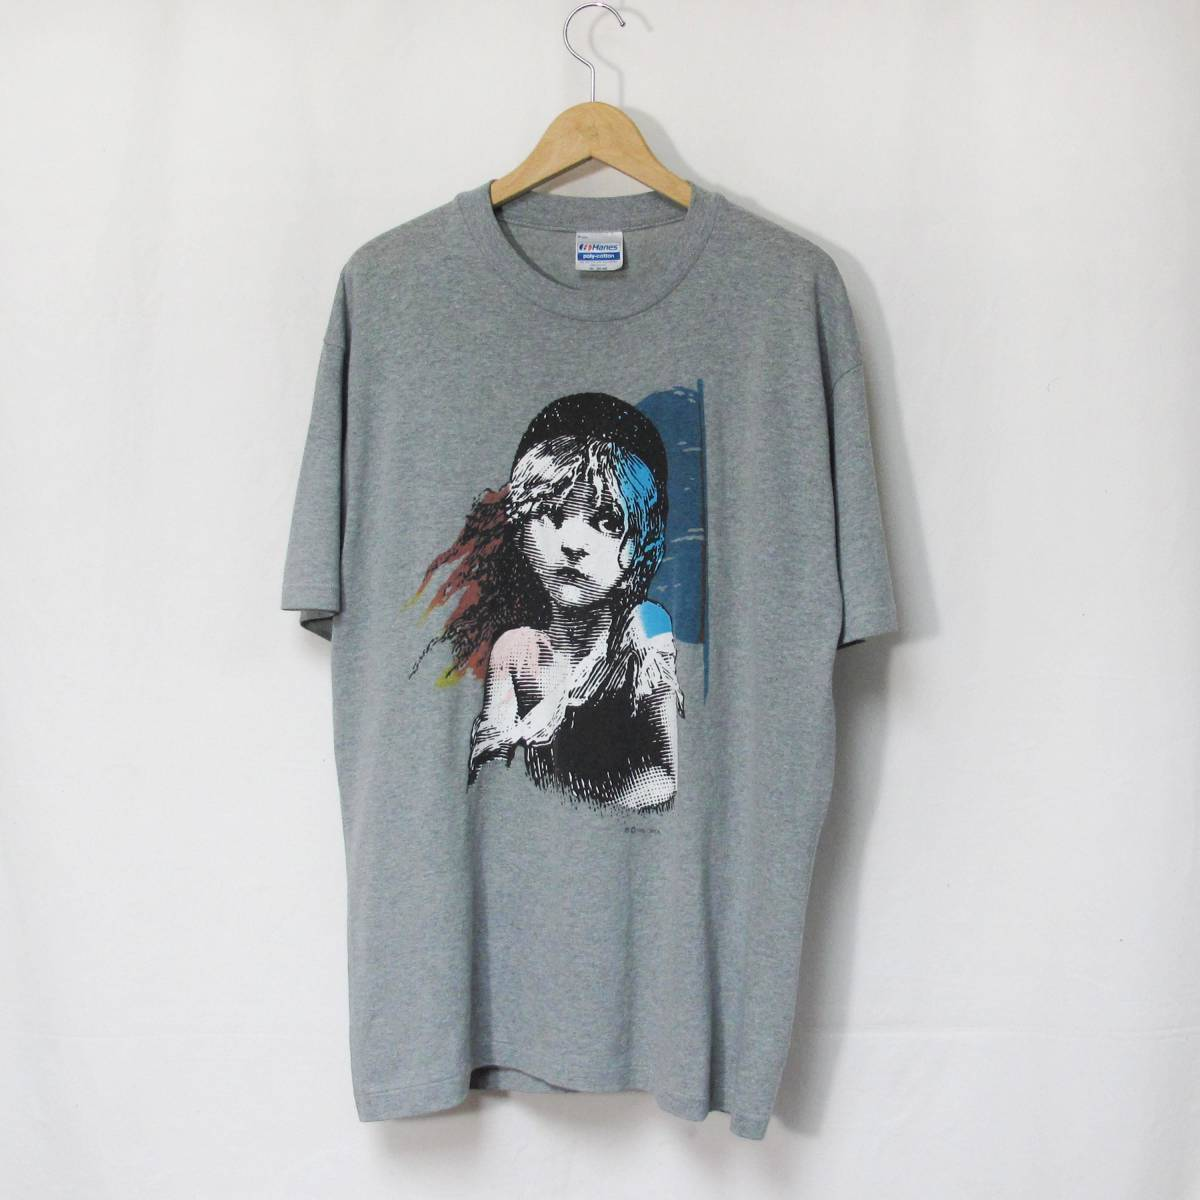 80s Les Miserables Tシャツ USA製 ミュージカル レ・ミゼラブル スウェット SUPREME スケート